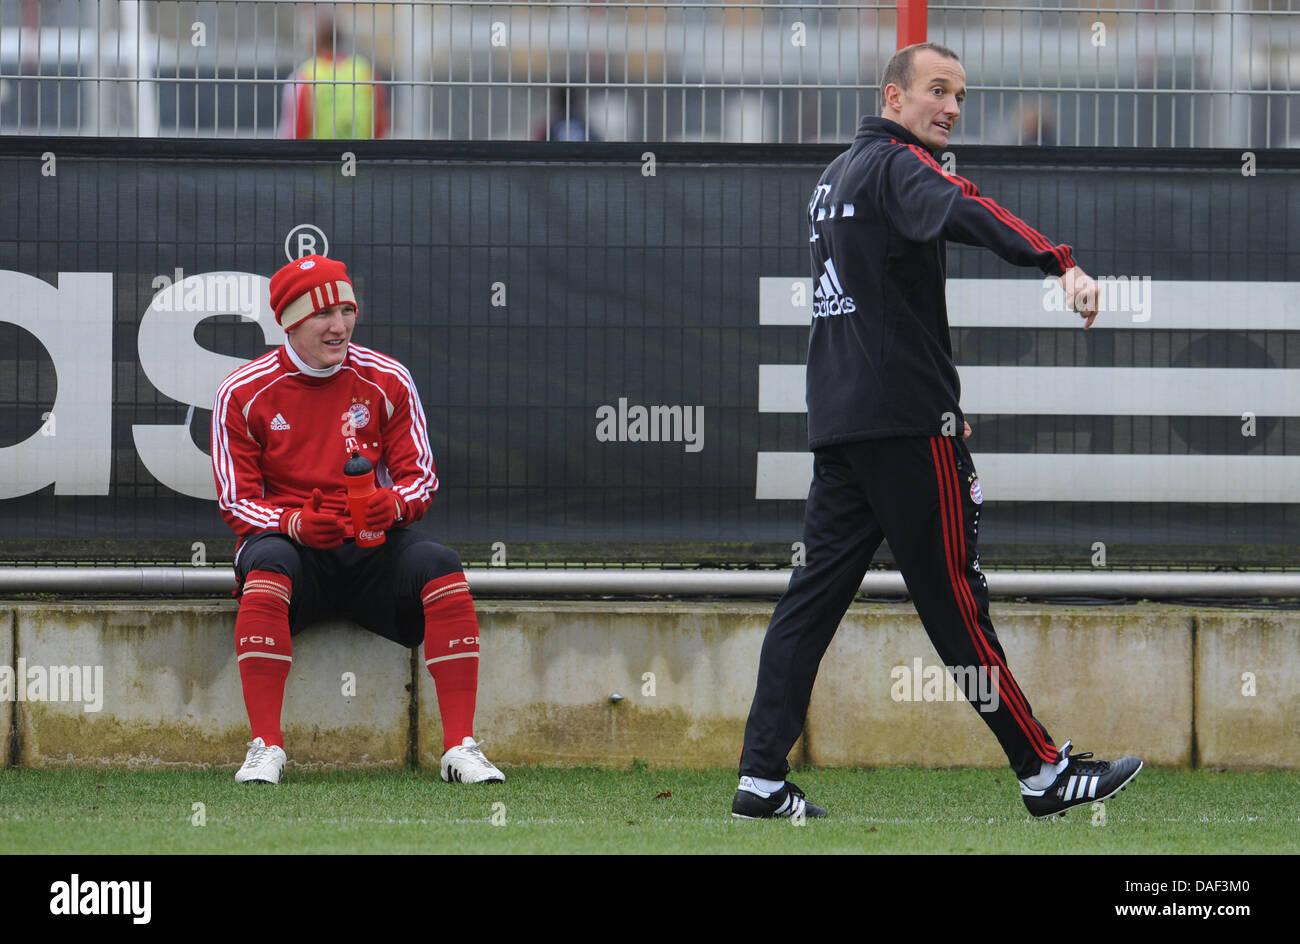 Professional soccer player Bastian Schweinsteiger (L) of FC